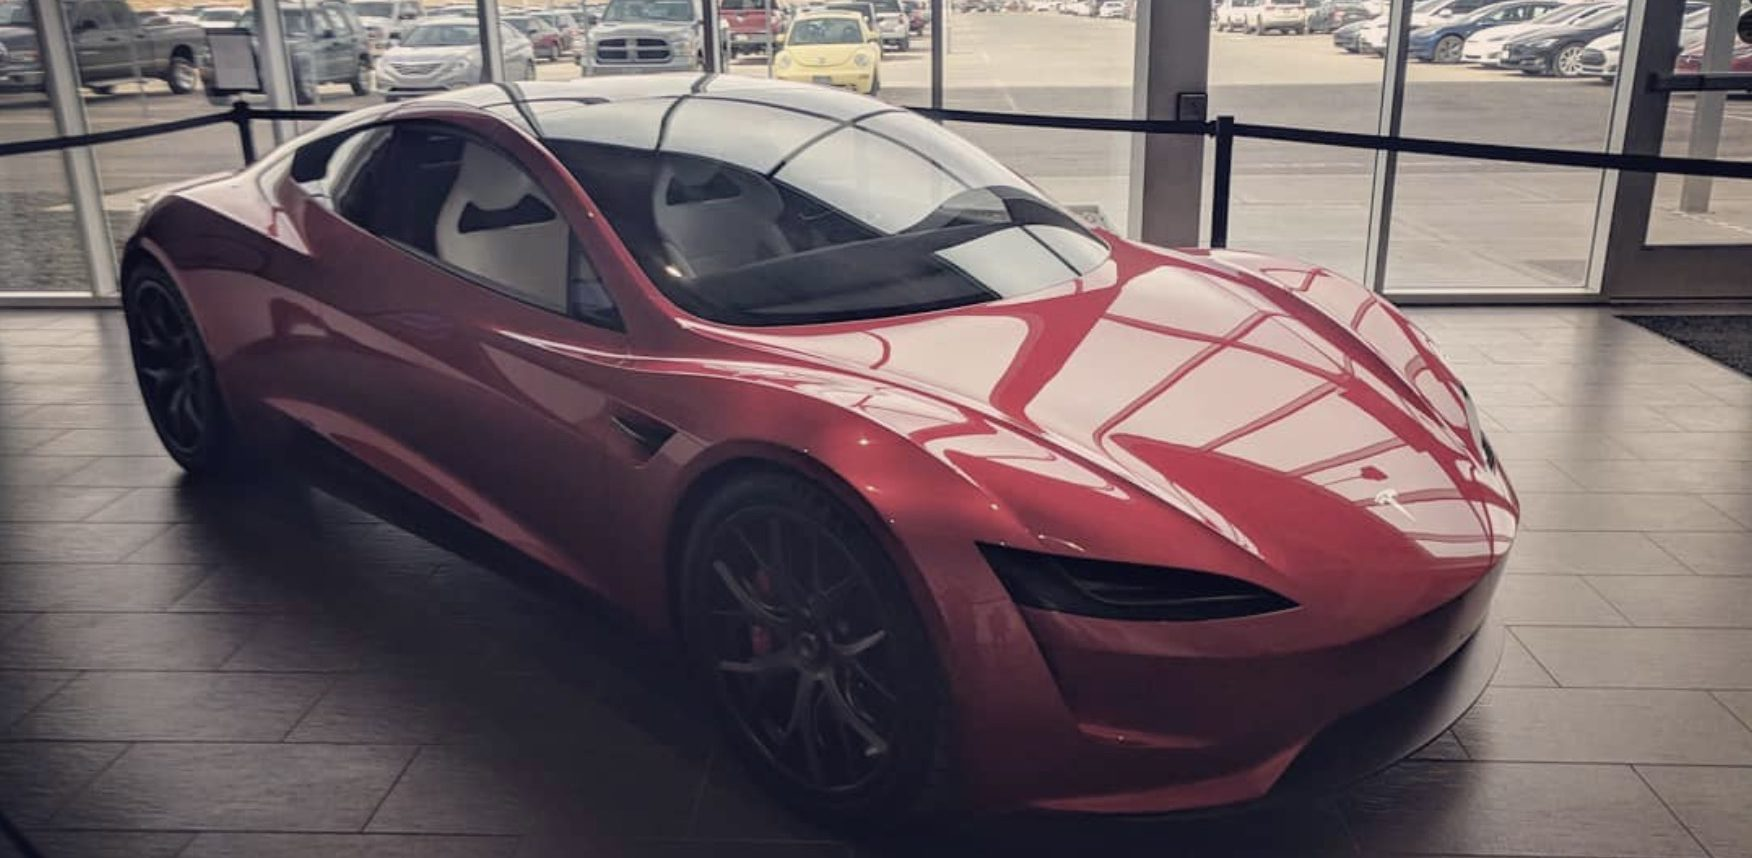 Tesla Next Generation Roadster Prototype Shows Up At